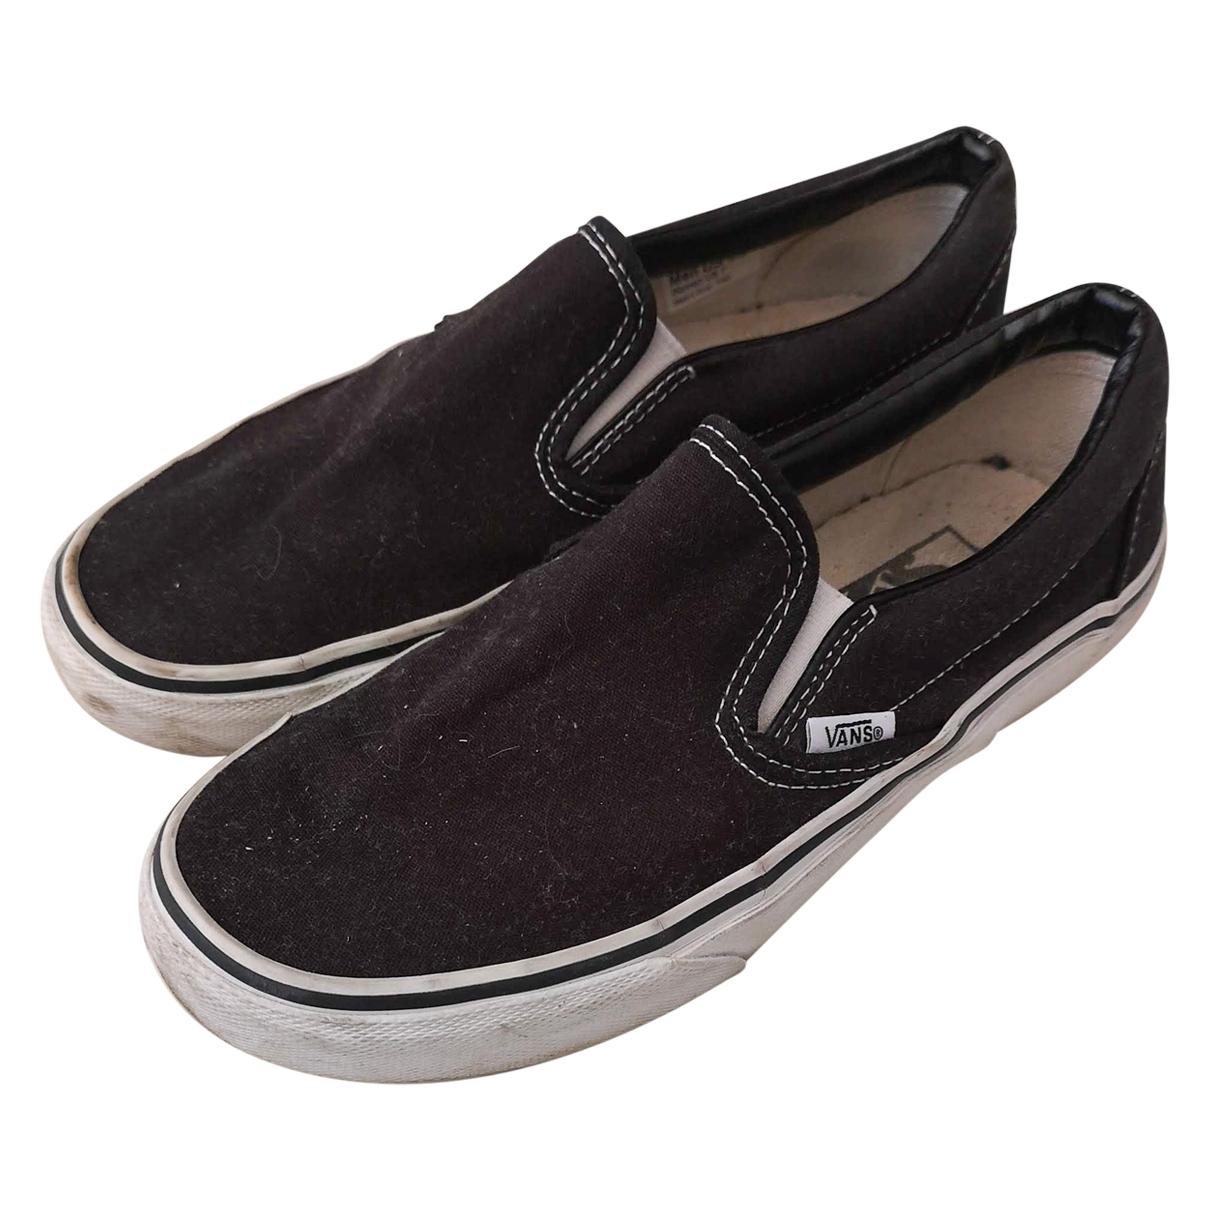 Vans \N Black Cloth Trainers for Women 7 US